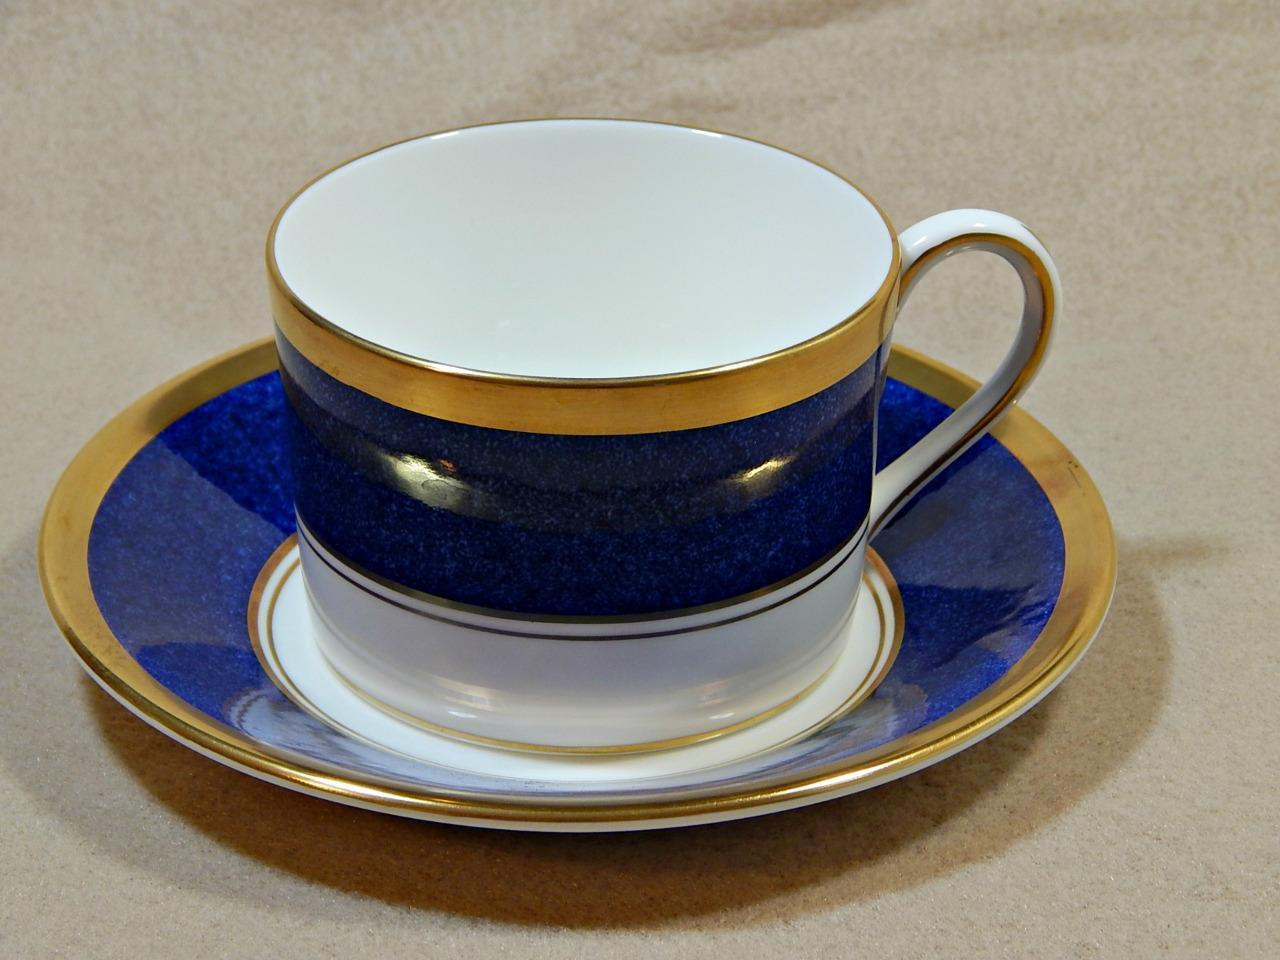 Athlone Blue Coalport England FLAT CUP + SAUCER blue rim 22K gold trim G74